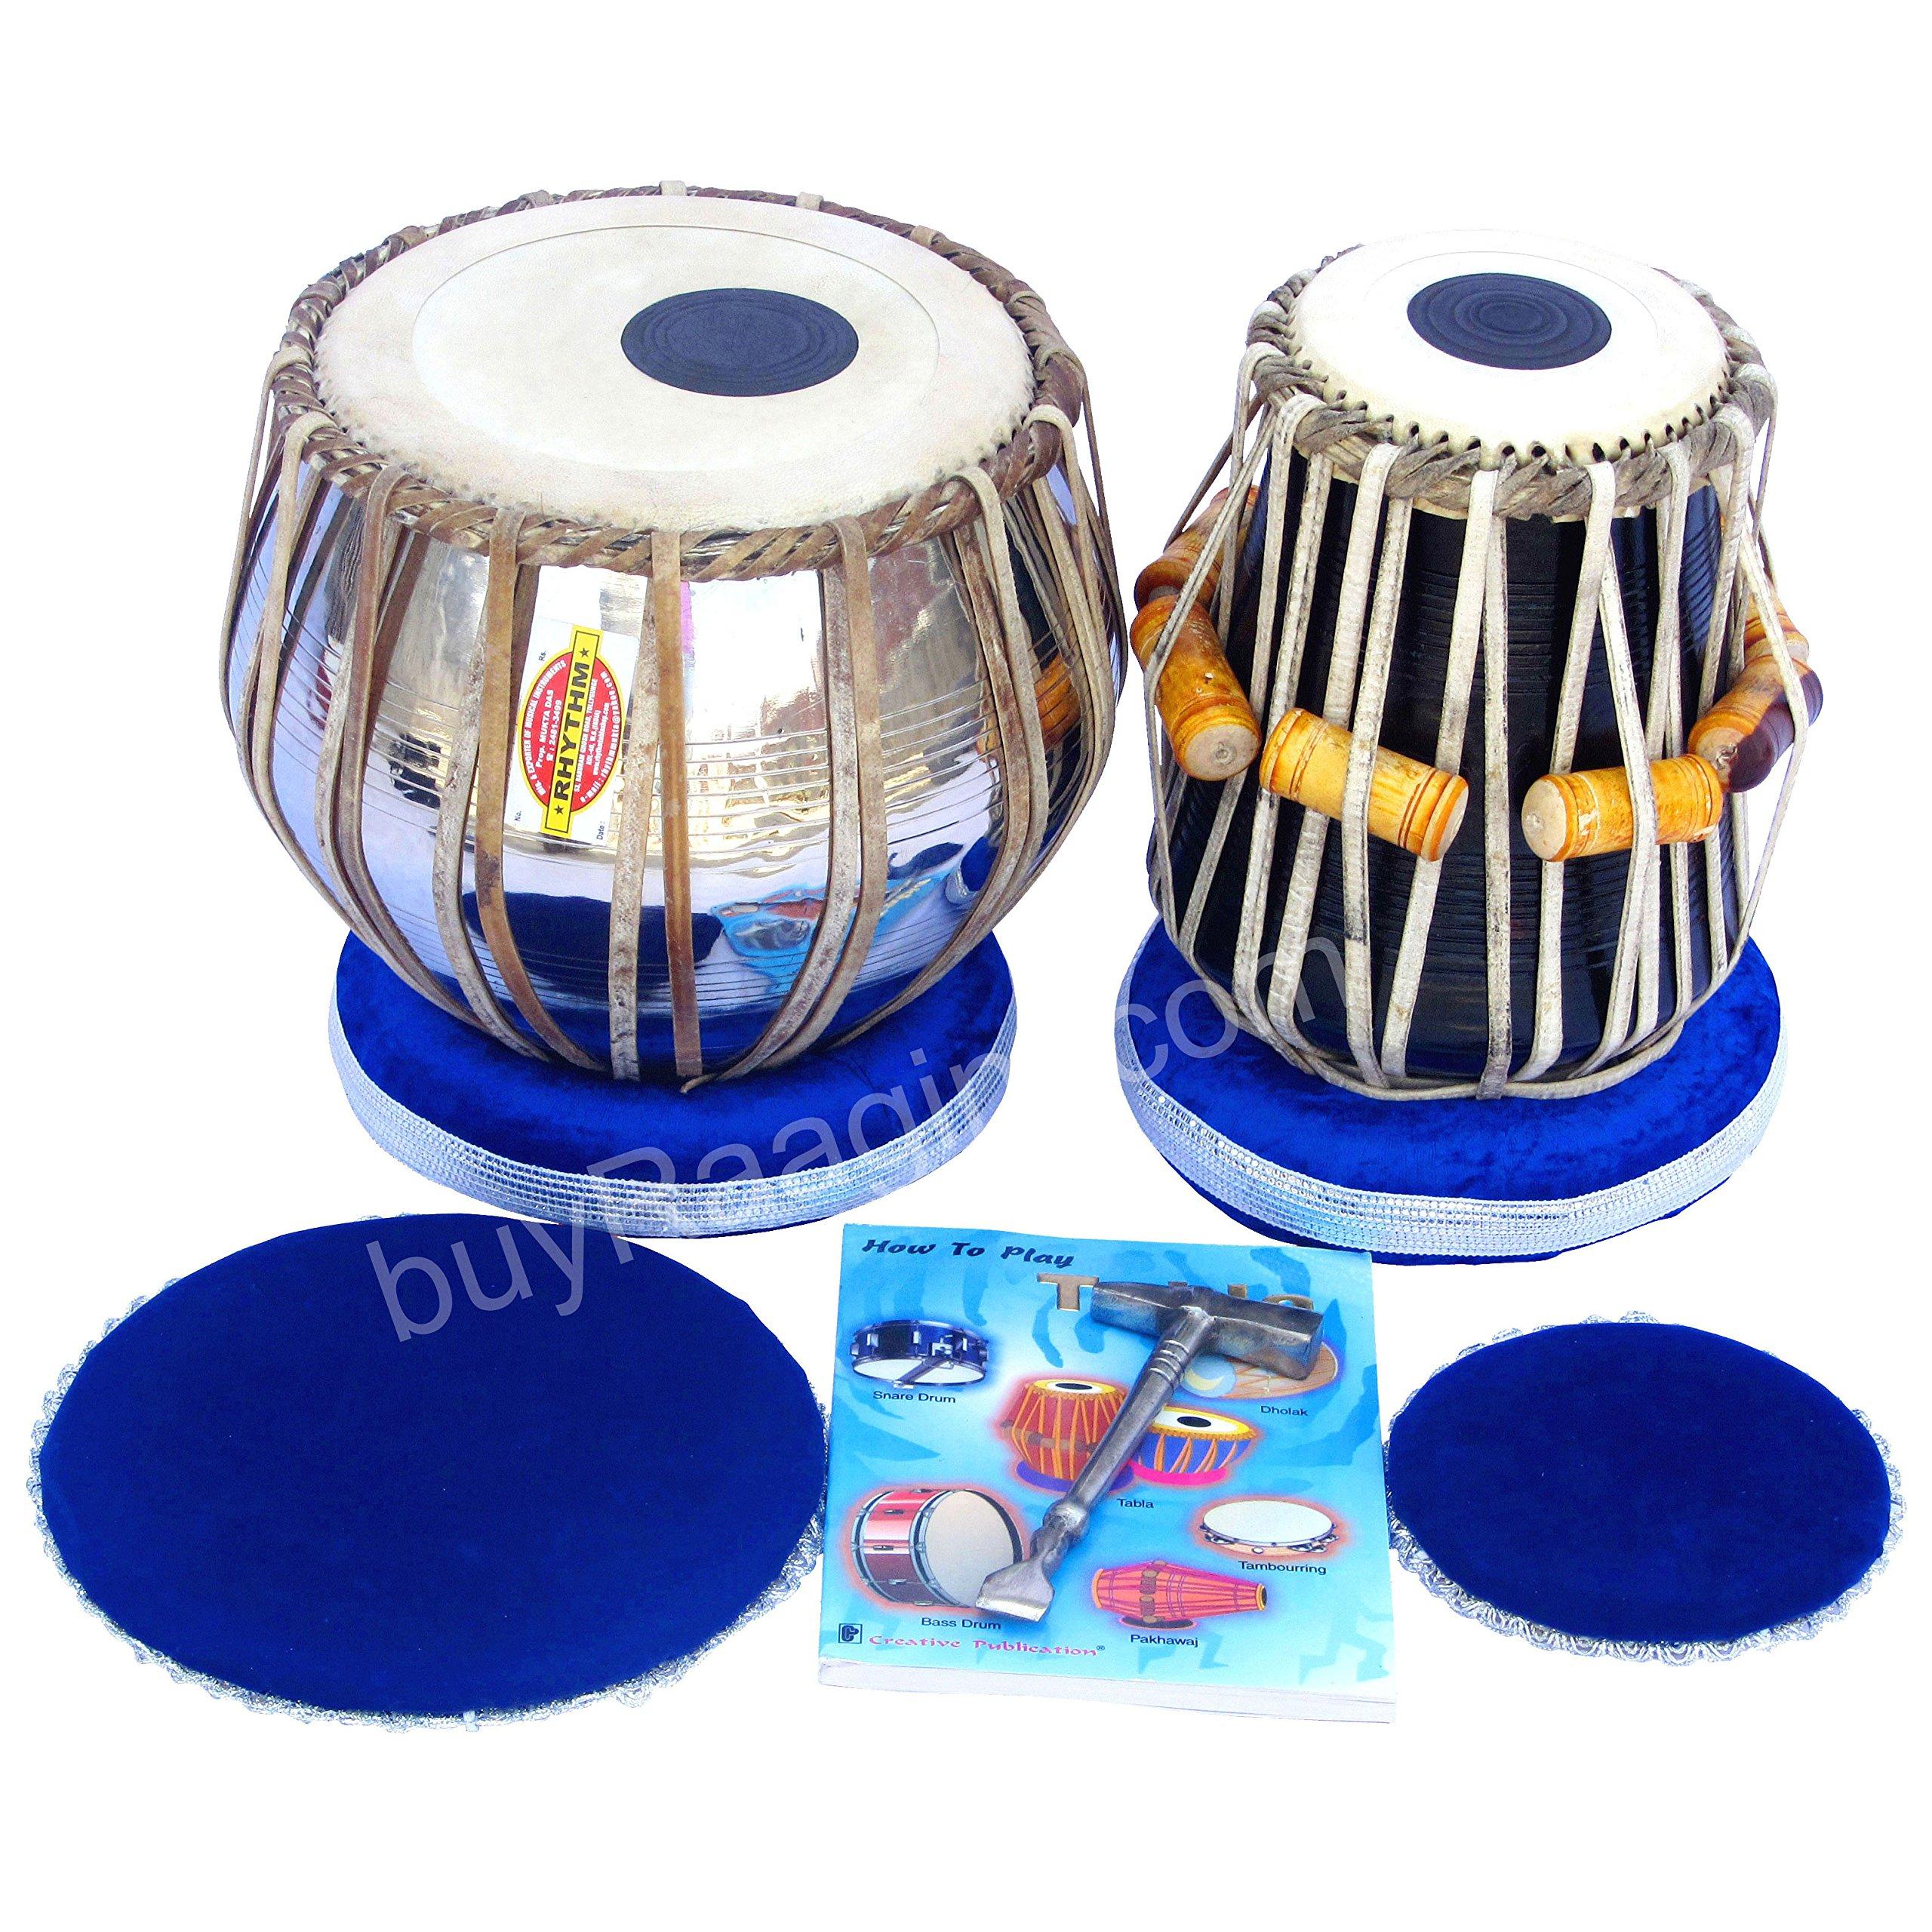 Mukta Das Tabla Set, Professional Tabla, 2.5 Kilograms Brass Bayan, Sheesham Tabla Dayan - Tuneable To C Sharp, Padded Bag, Book, Hammer, Cushions, Cover, Tabla Hand Drums (PDI-AIF)